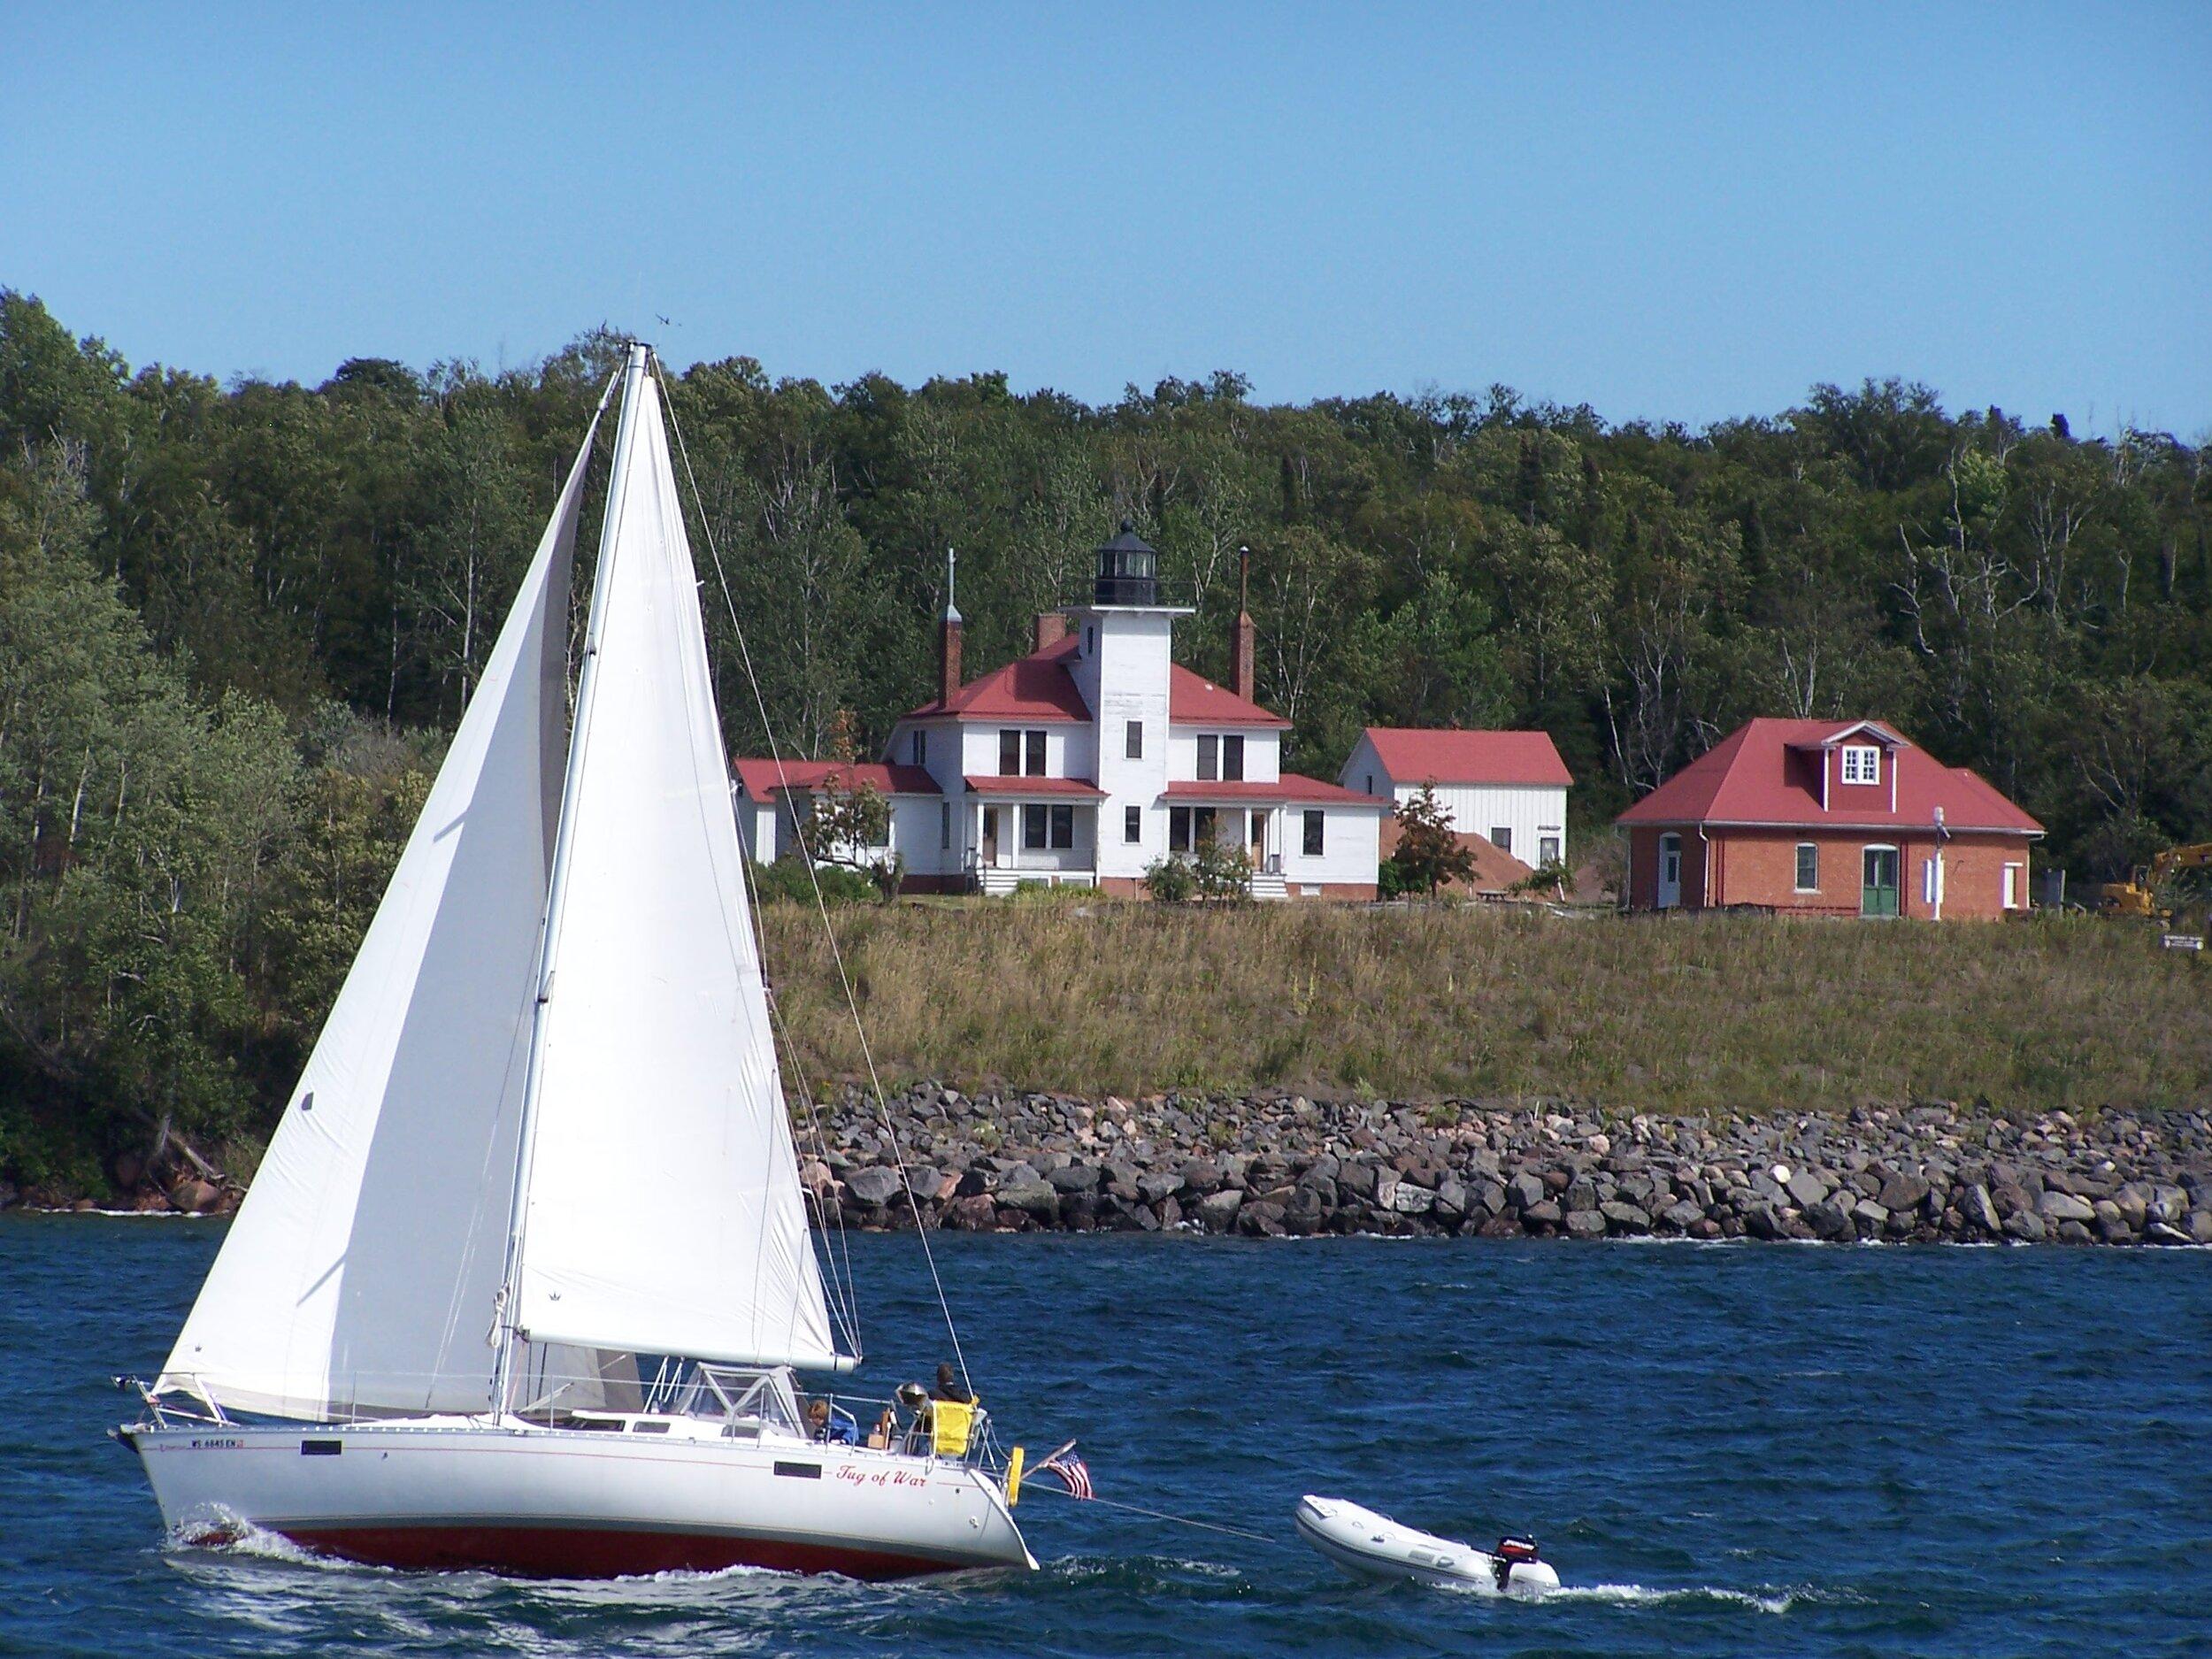 <h4> Apostle Islands National Lakeshore </h4>